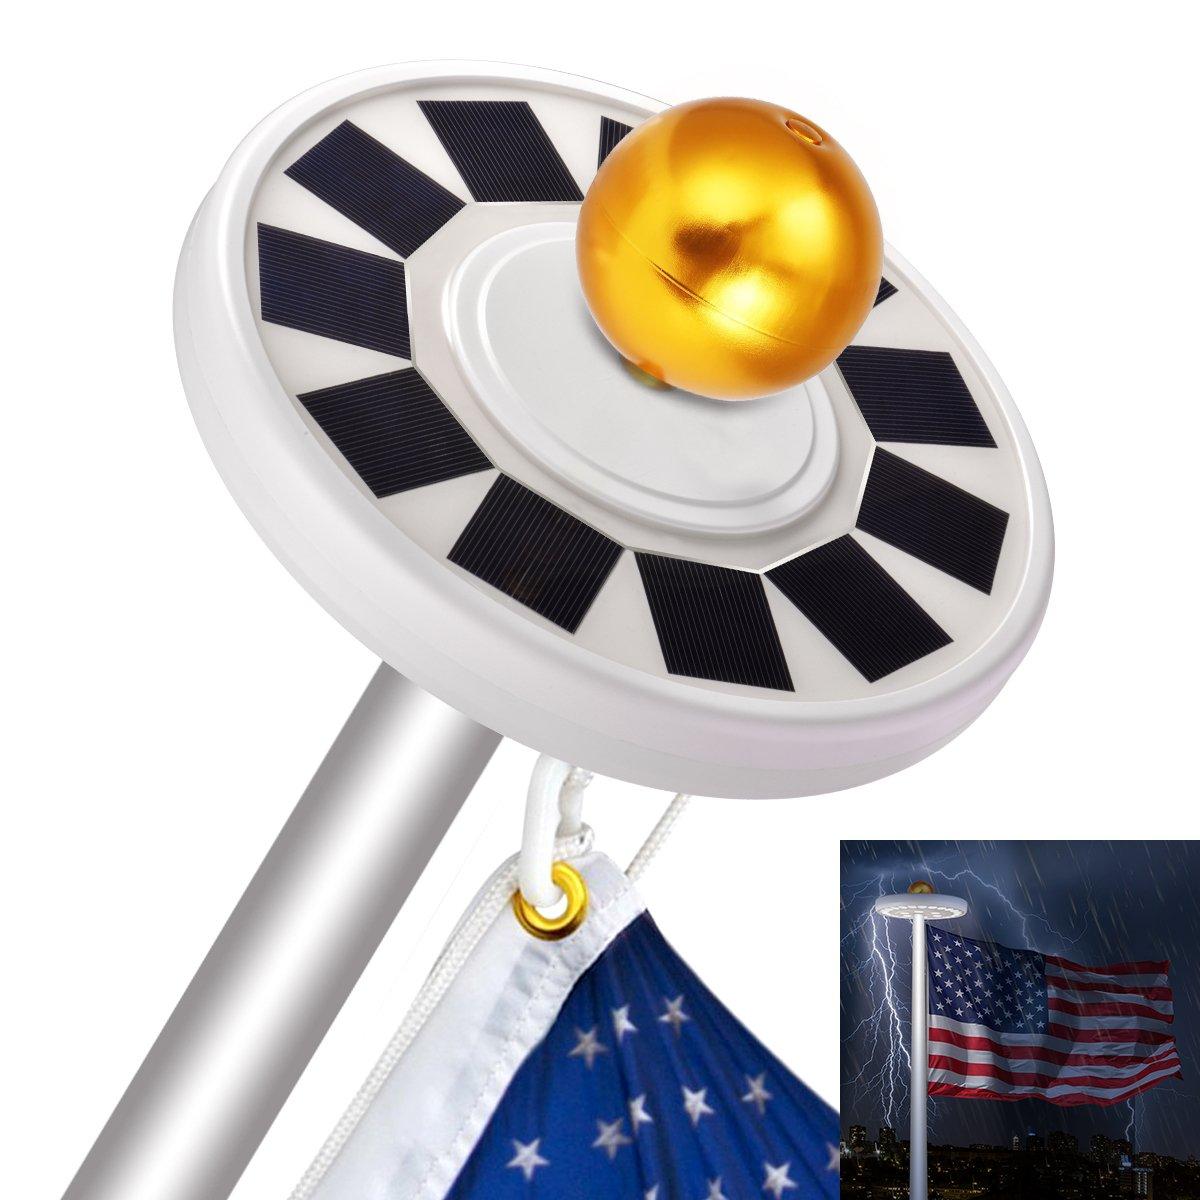 Sunix 30 LED Solar Flag Pole Lights, IP65 Weatherproof Flagpole Downlight with 11 Pcs Big Solar Panel for 15 to 25 Ft, Auto On/Off Night Lighting